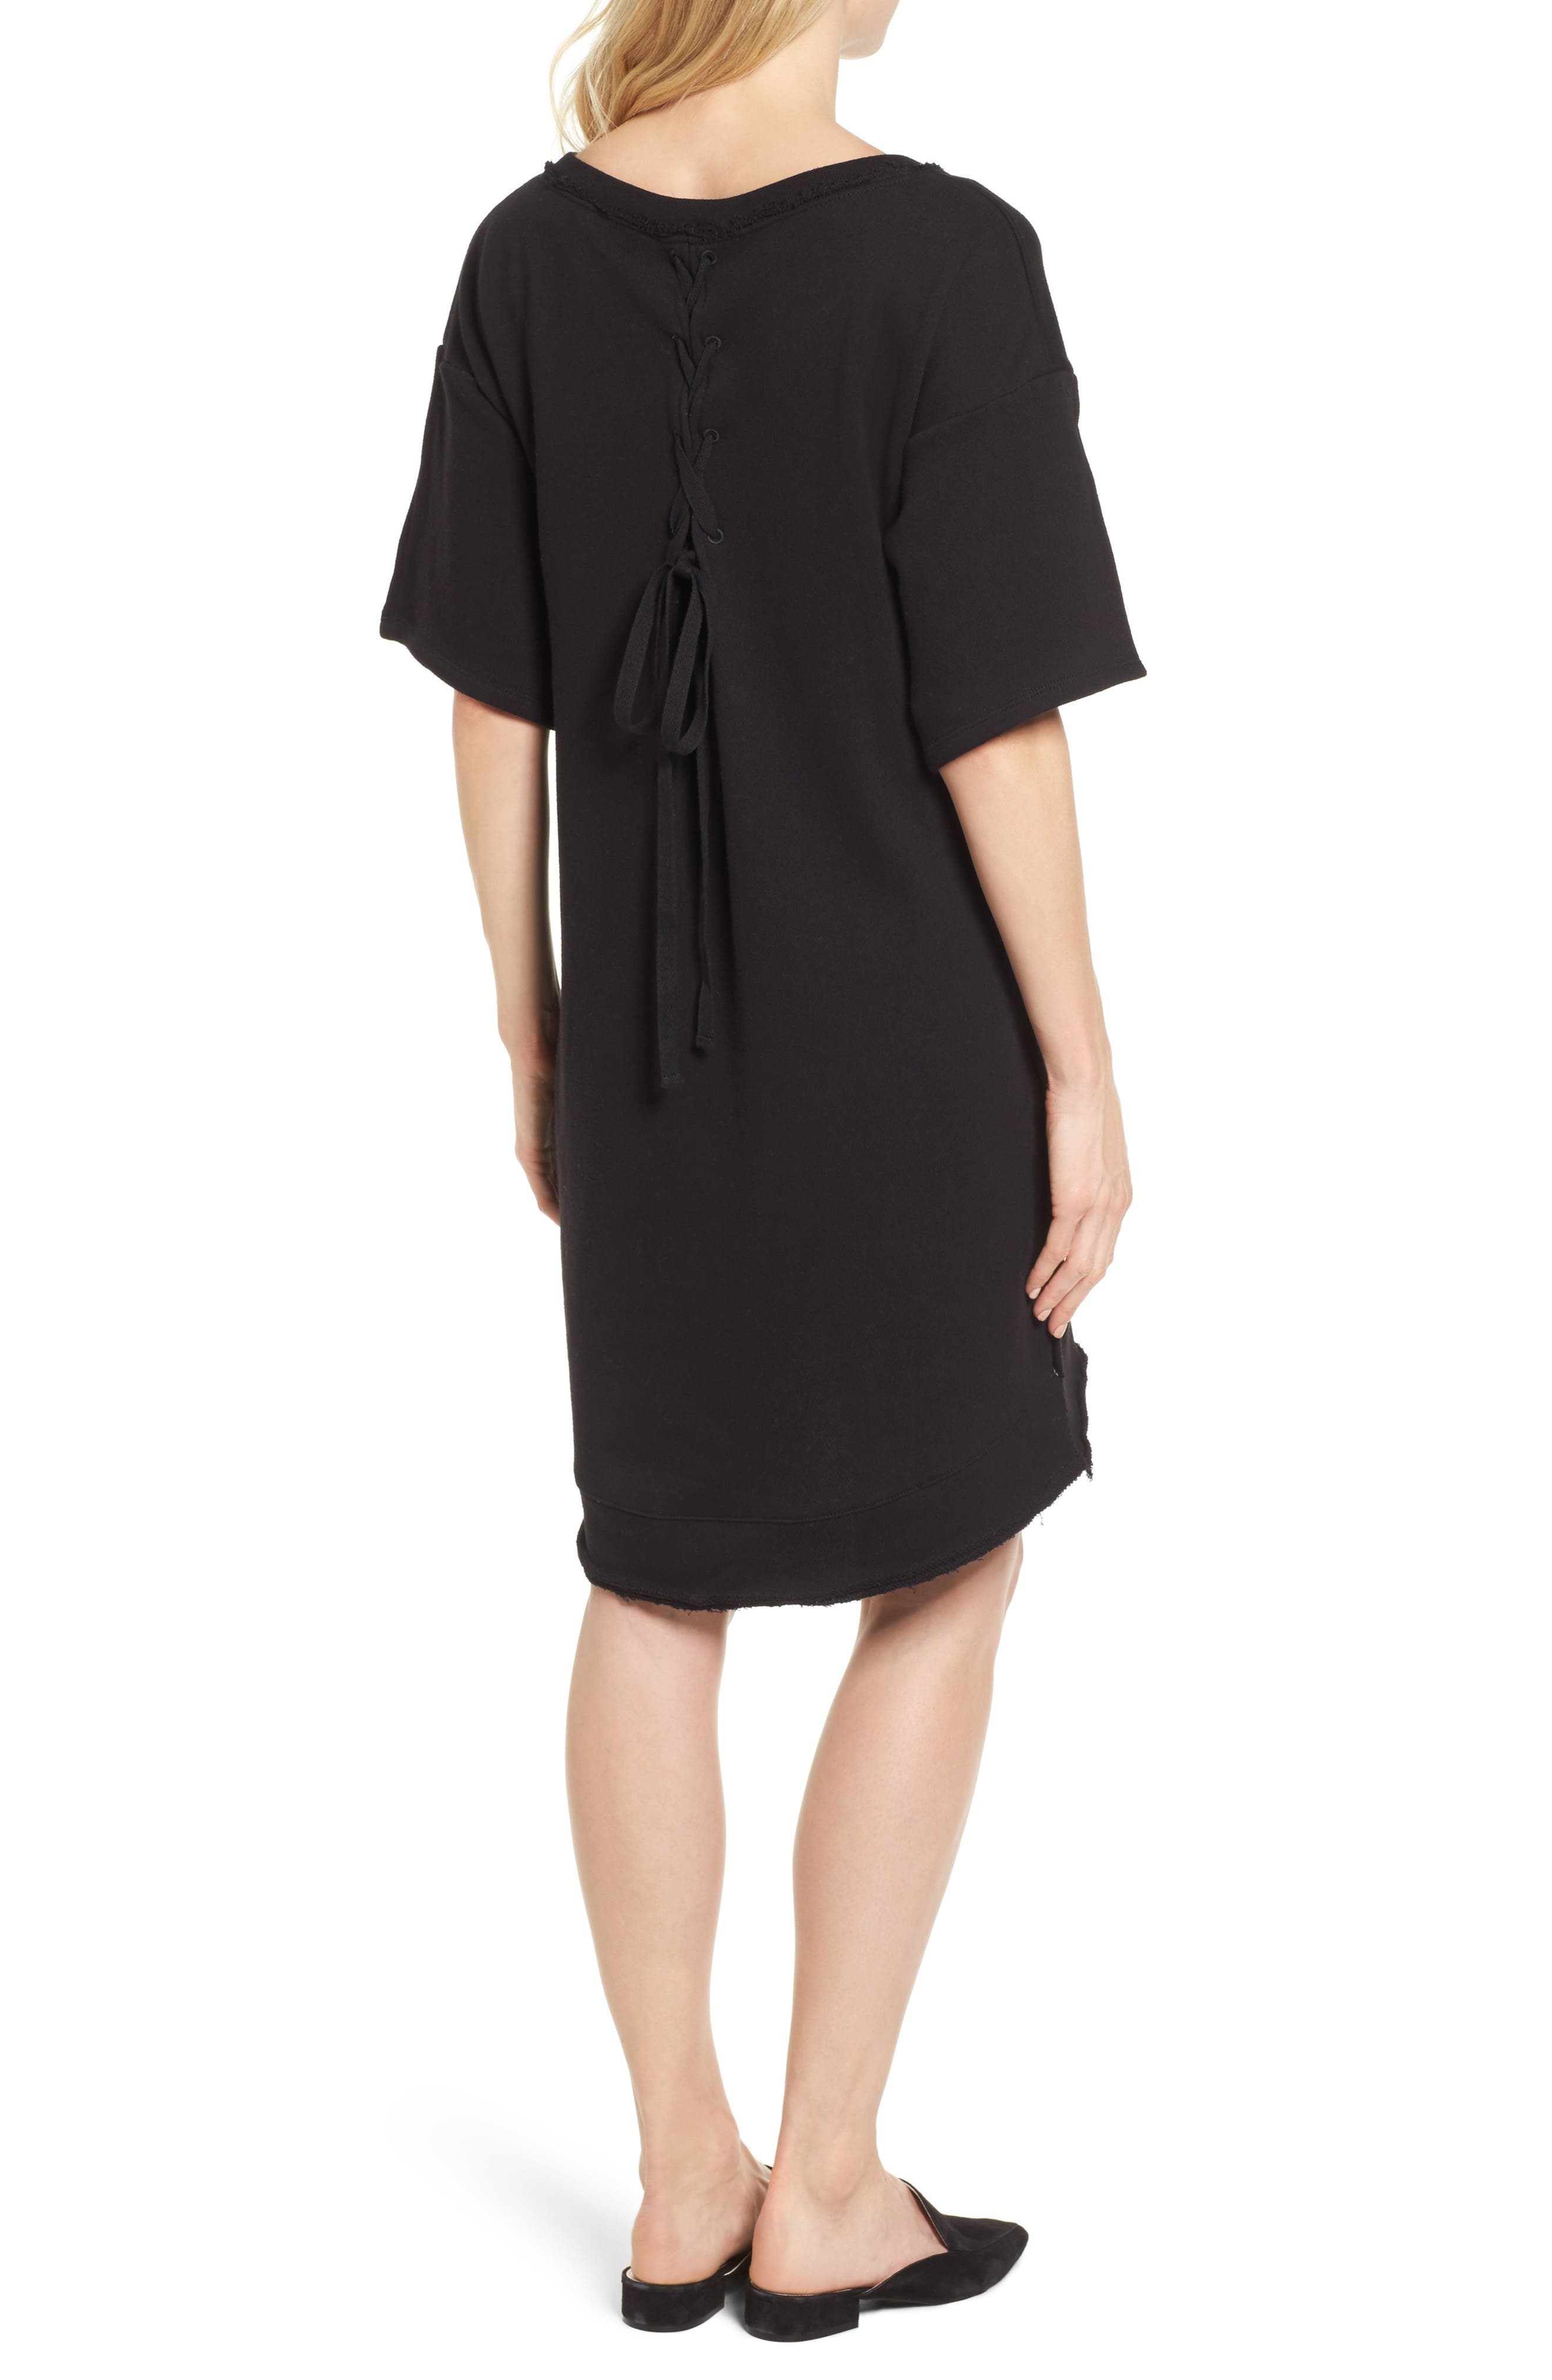 Lace-Up T-Shirt Dress,                             Alternate thumbnail 2, color,                             Black